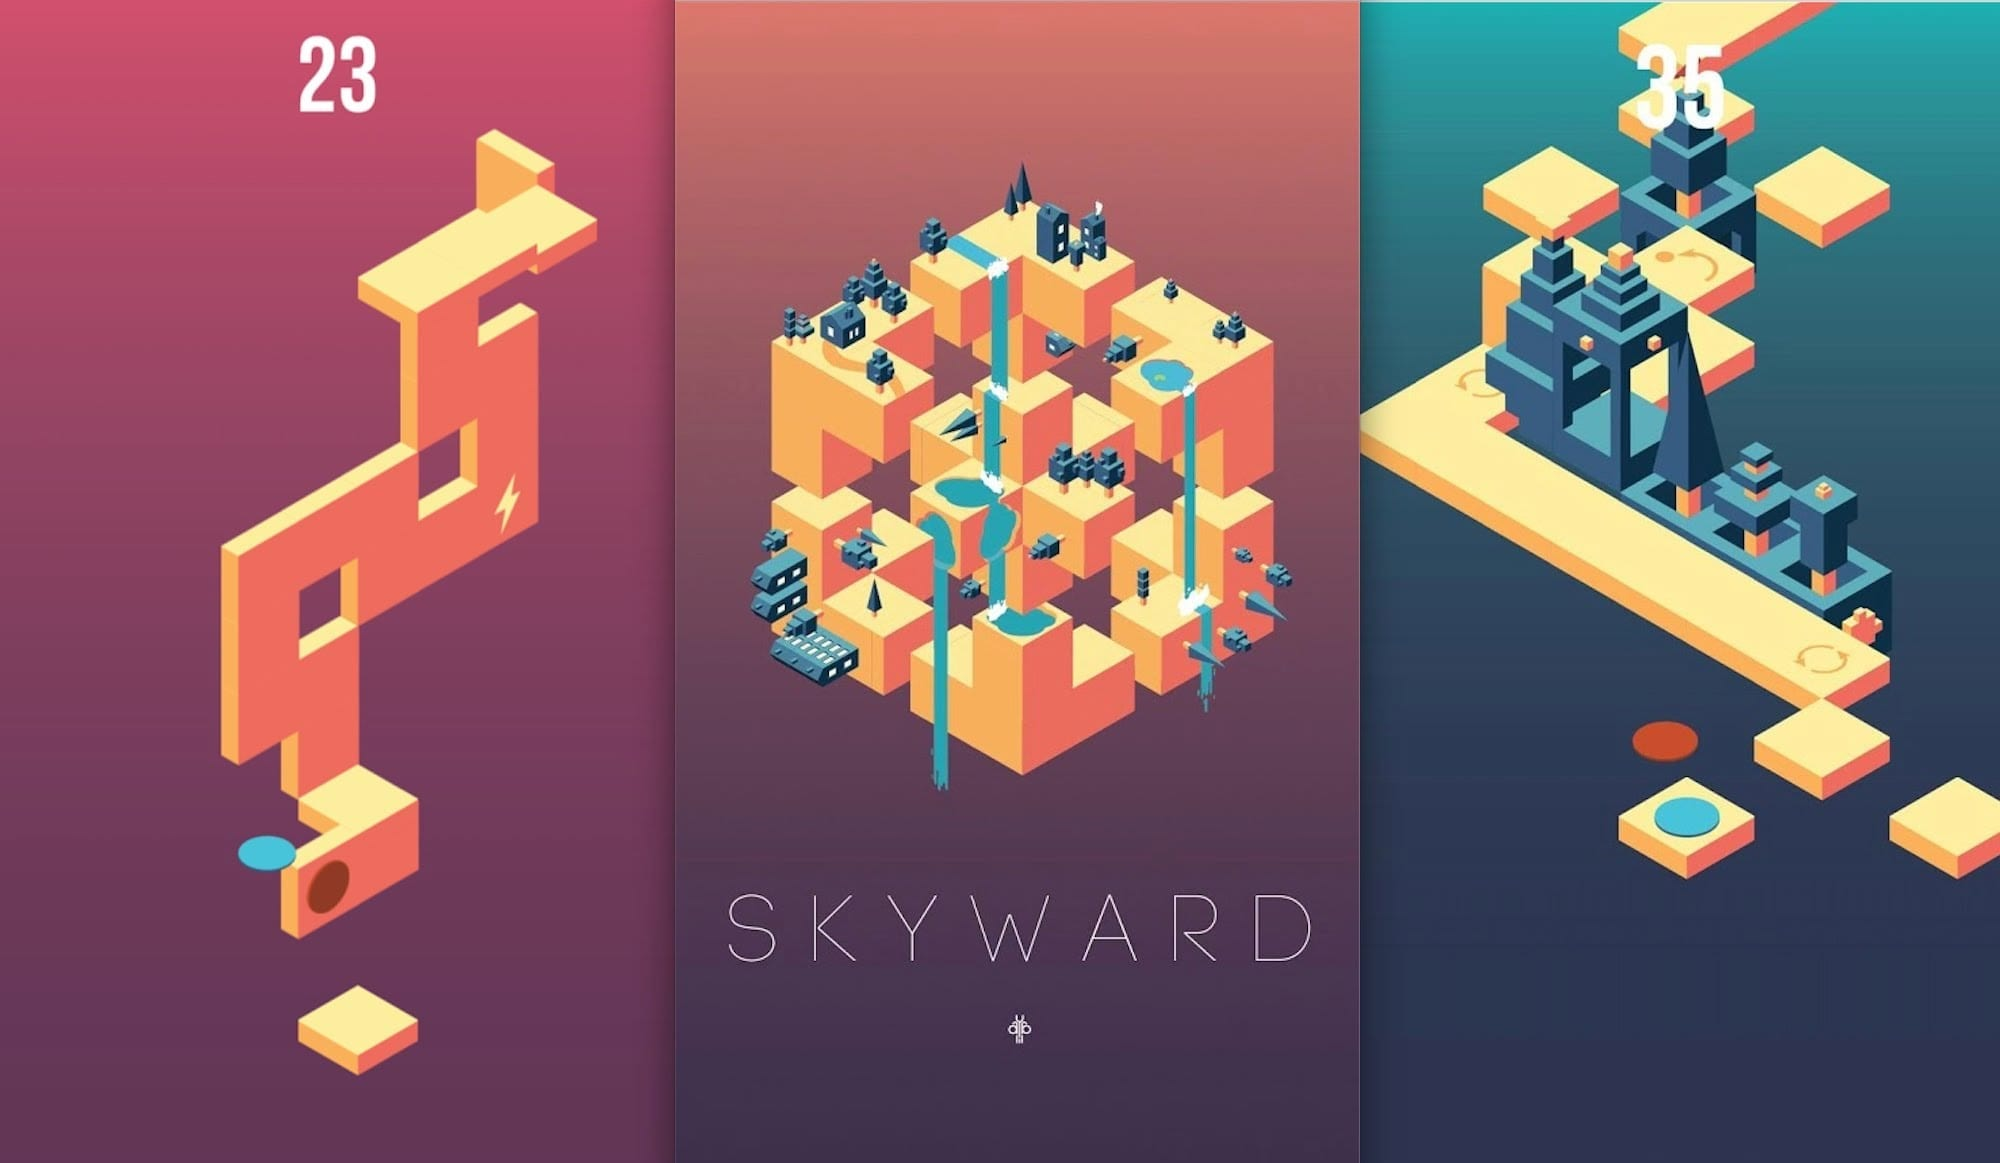 TOP 10 Jeux Mobile My Geek Actu Skyward